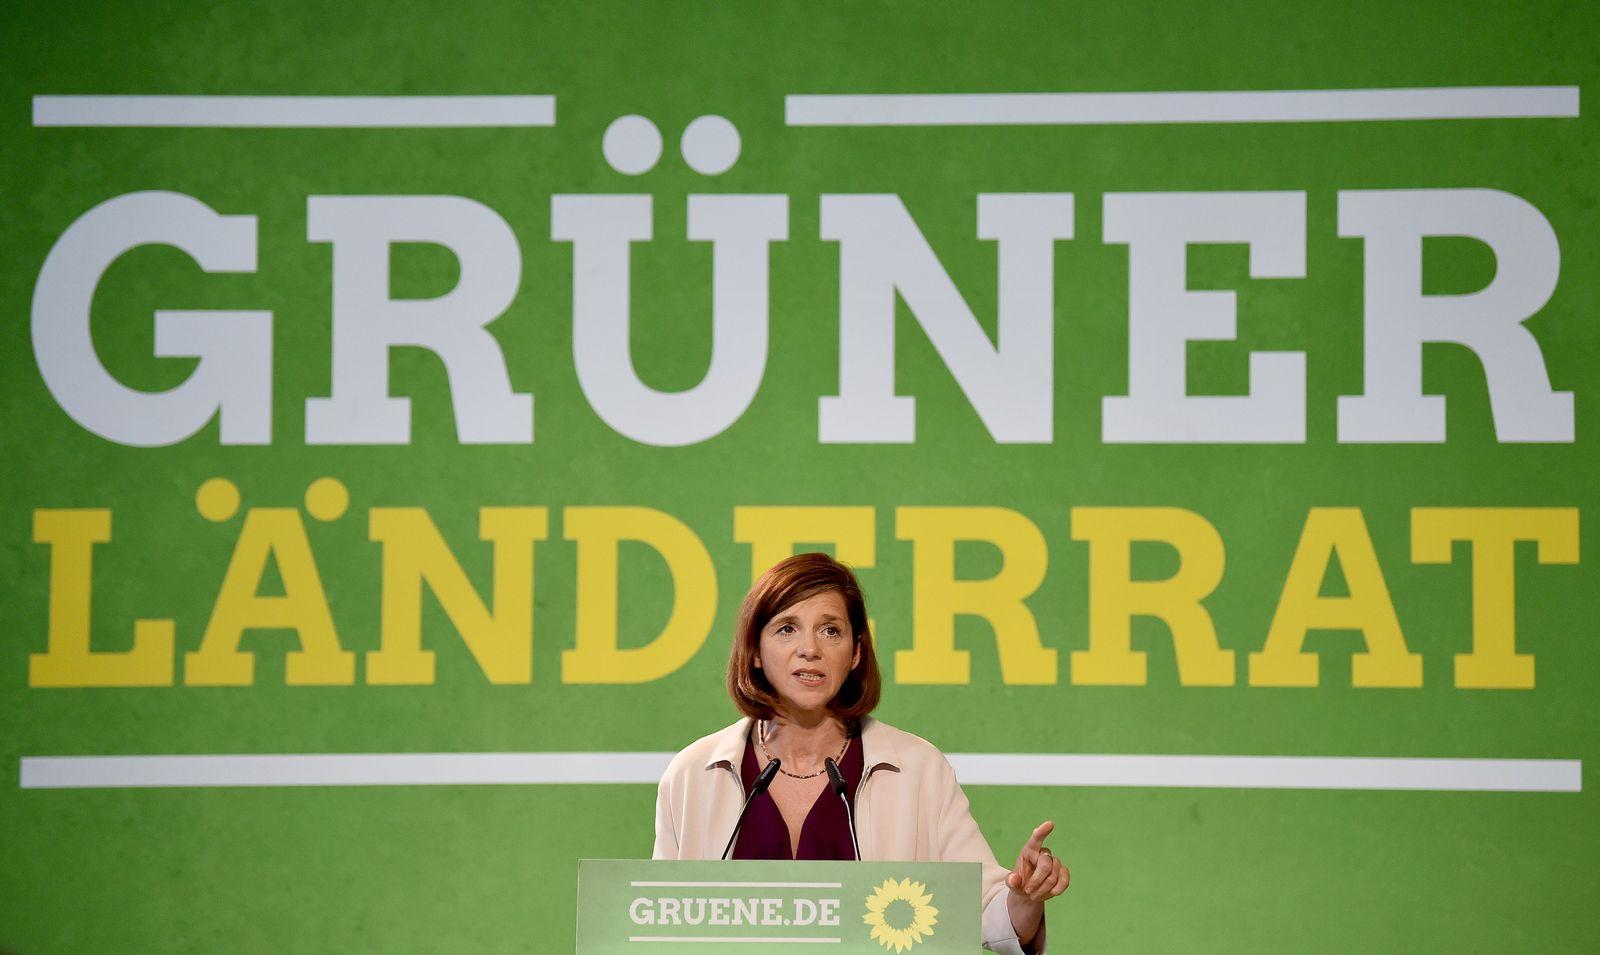 Katrin Göring-Eckardt / Länderrat Bündnis 90/Die Grünen